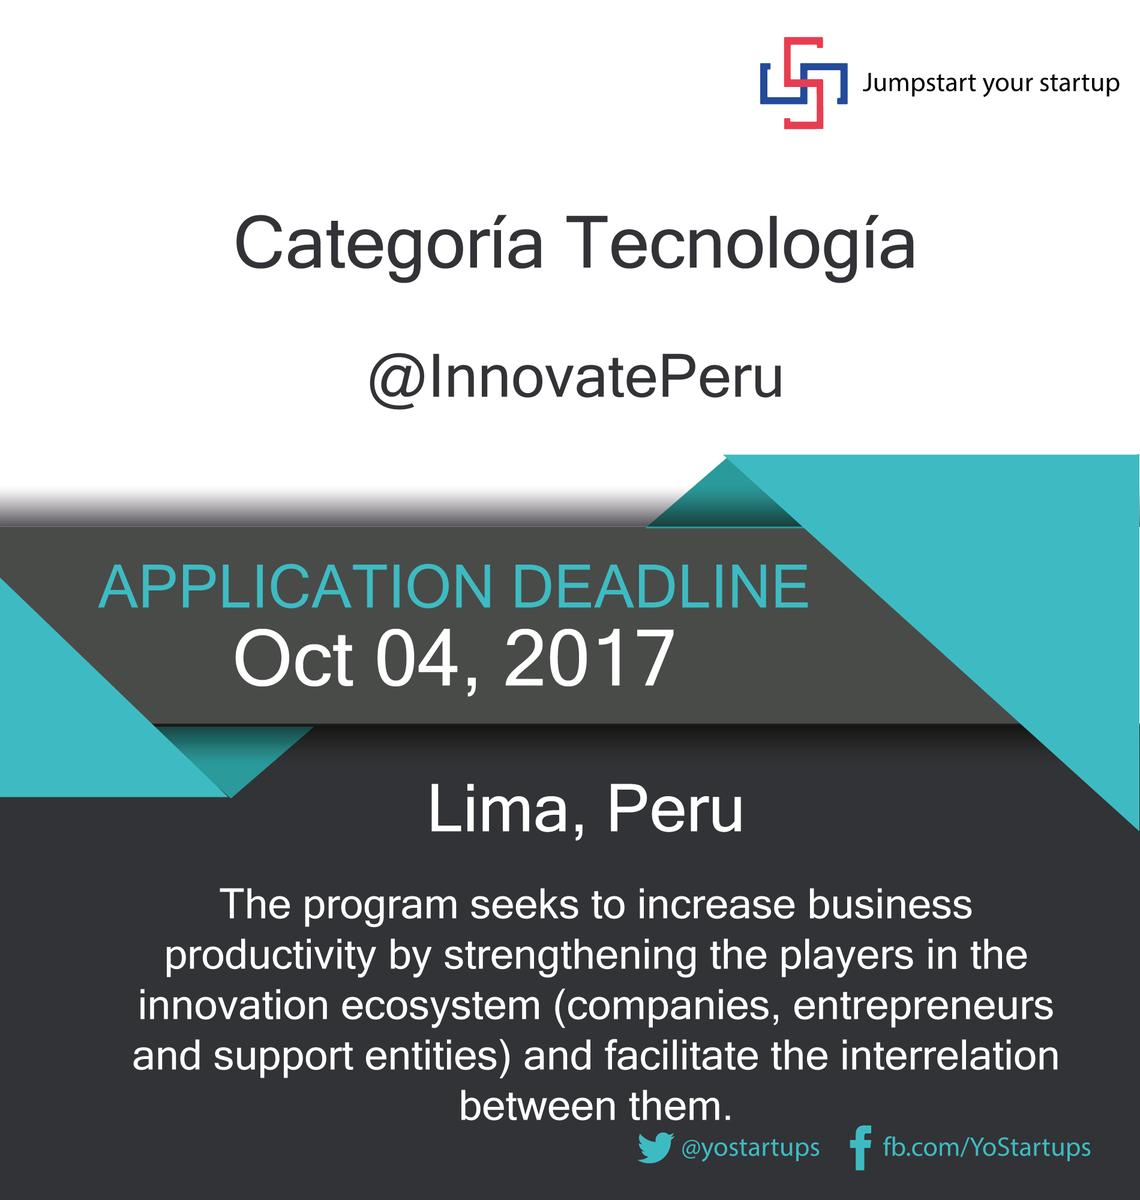 Checkout @InnovatePeru #accelerator program in #Peru strengthening the startup ecosystem  https:// goo.gl/hs9EQK  &nbsp;  <br>http://pic.twitter.com/a4Uw5HWwAV